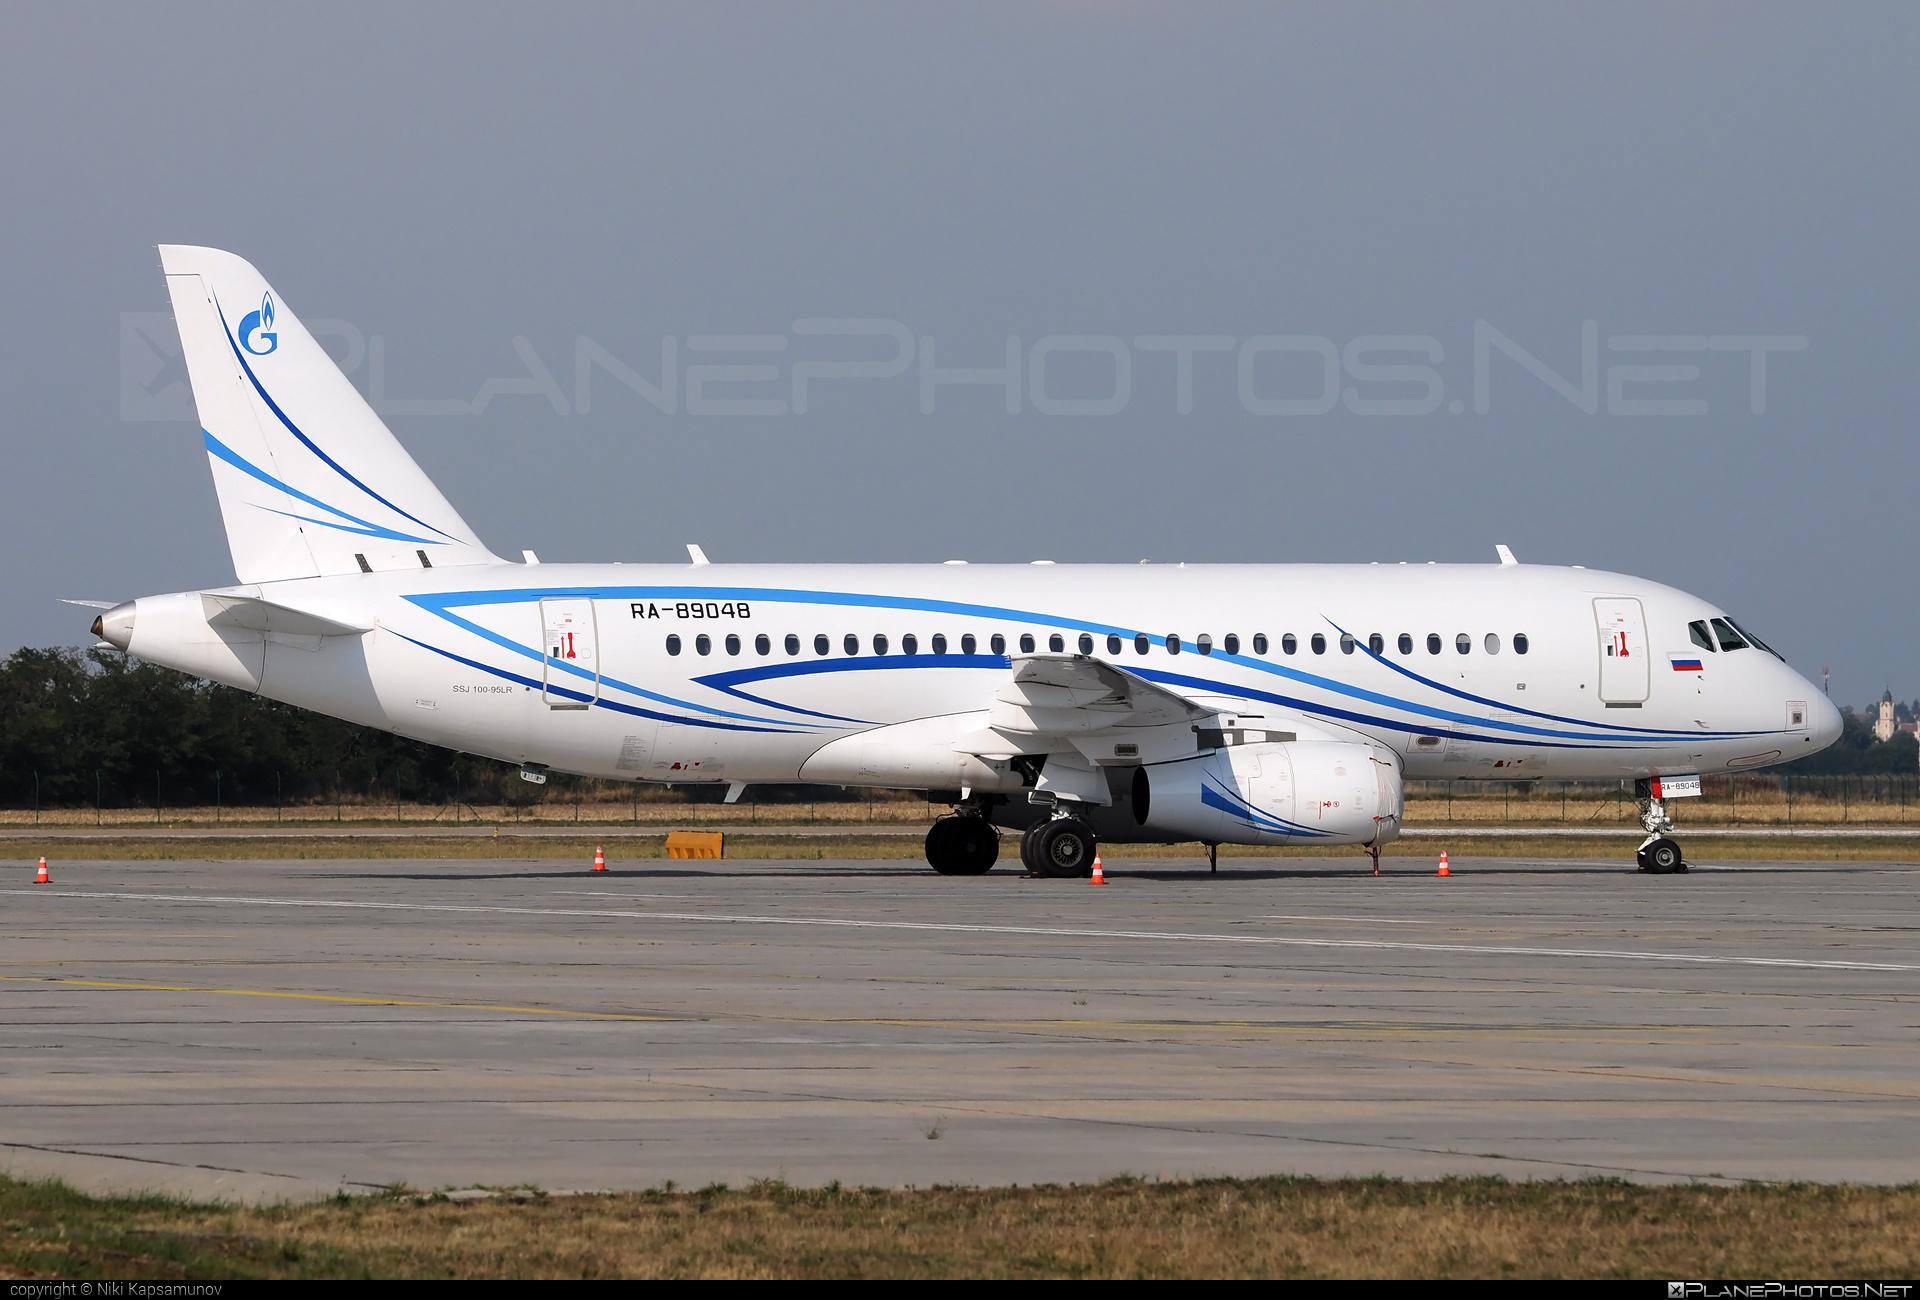 Sukhoi SSJ 100-95LR Superjet - RA-89048 operated by Gazpromavia #ssj100 #ssj10095lr #sukhoi #sukhoisuperjet #superjet